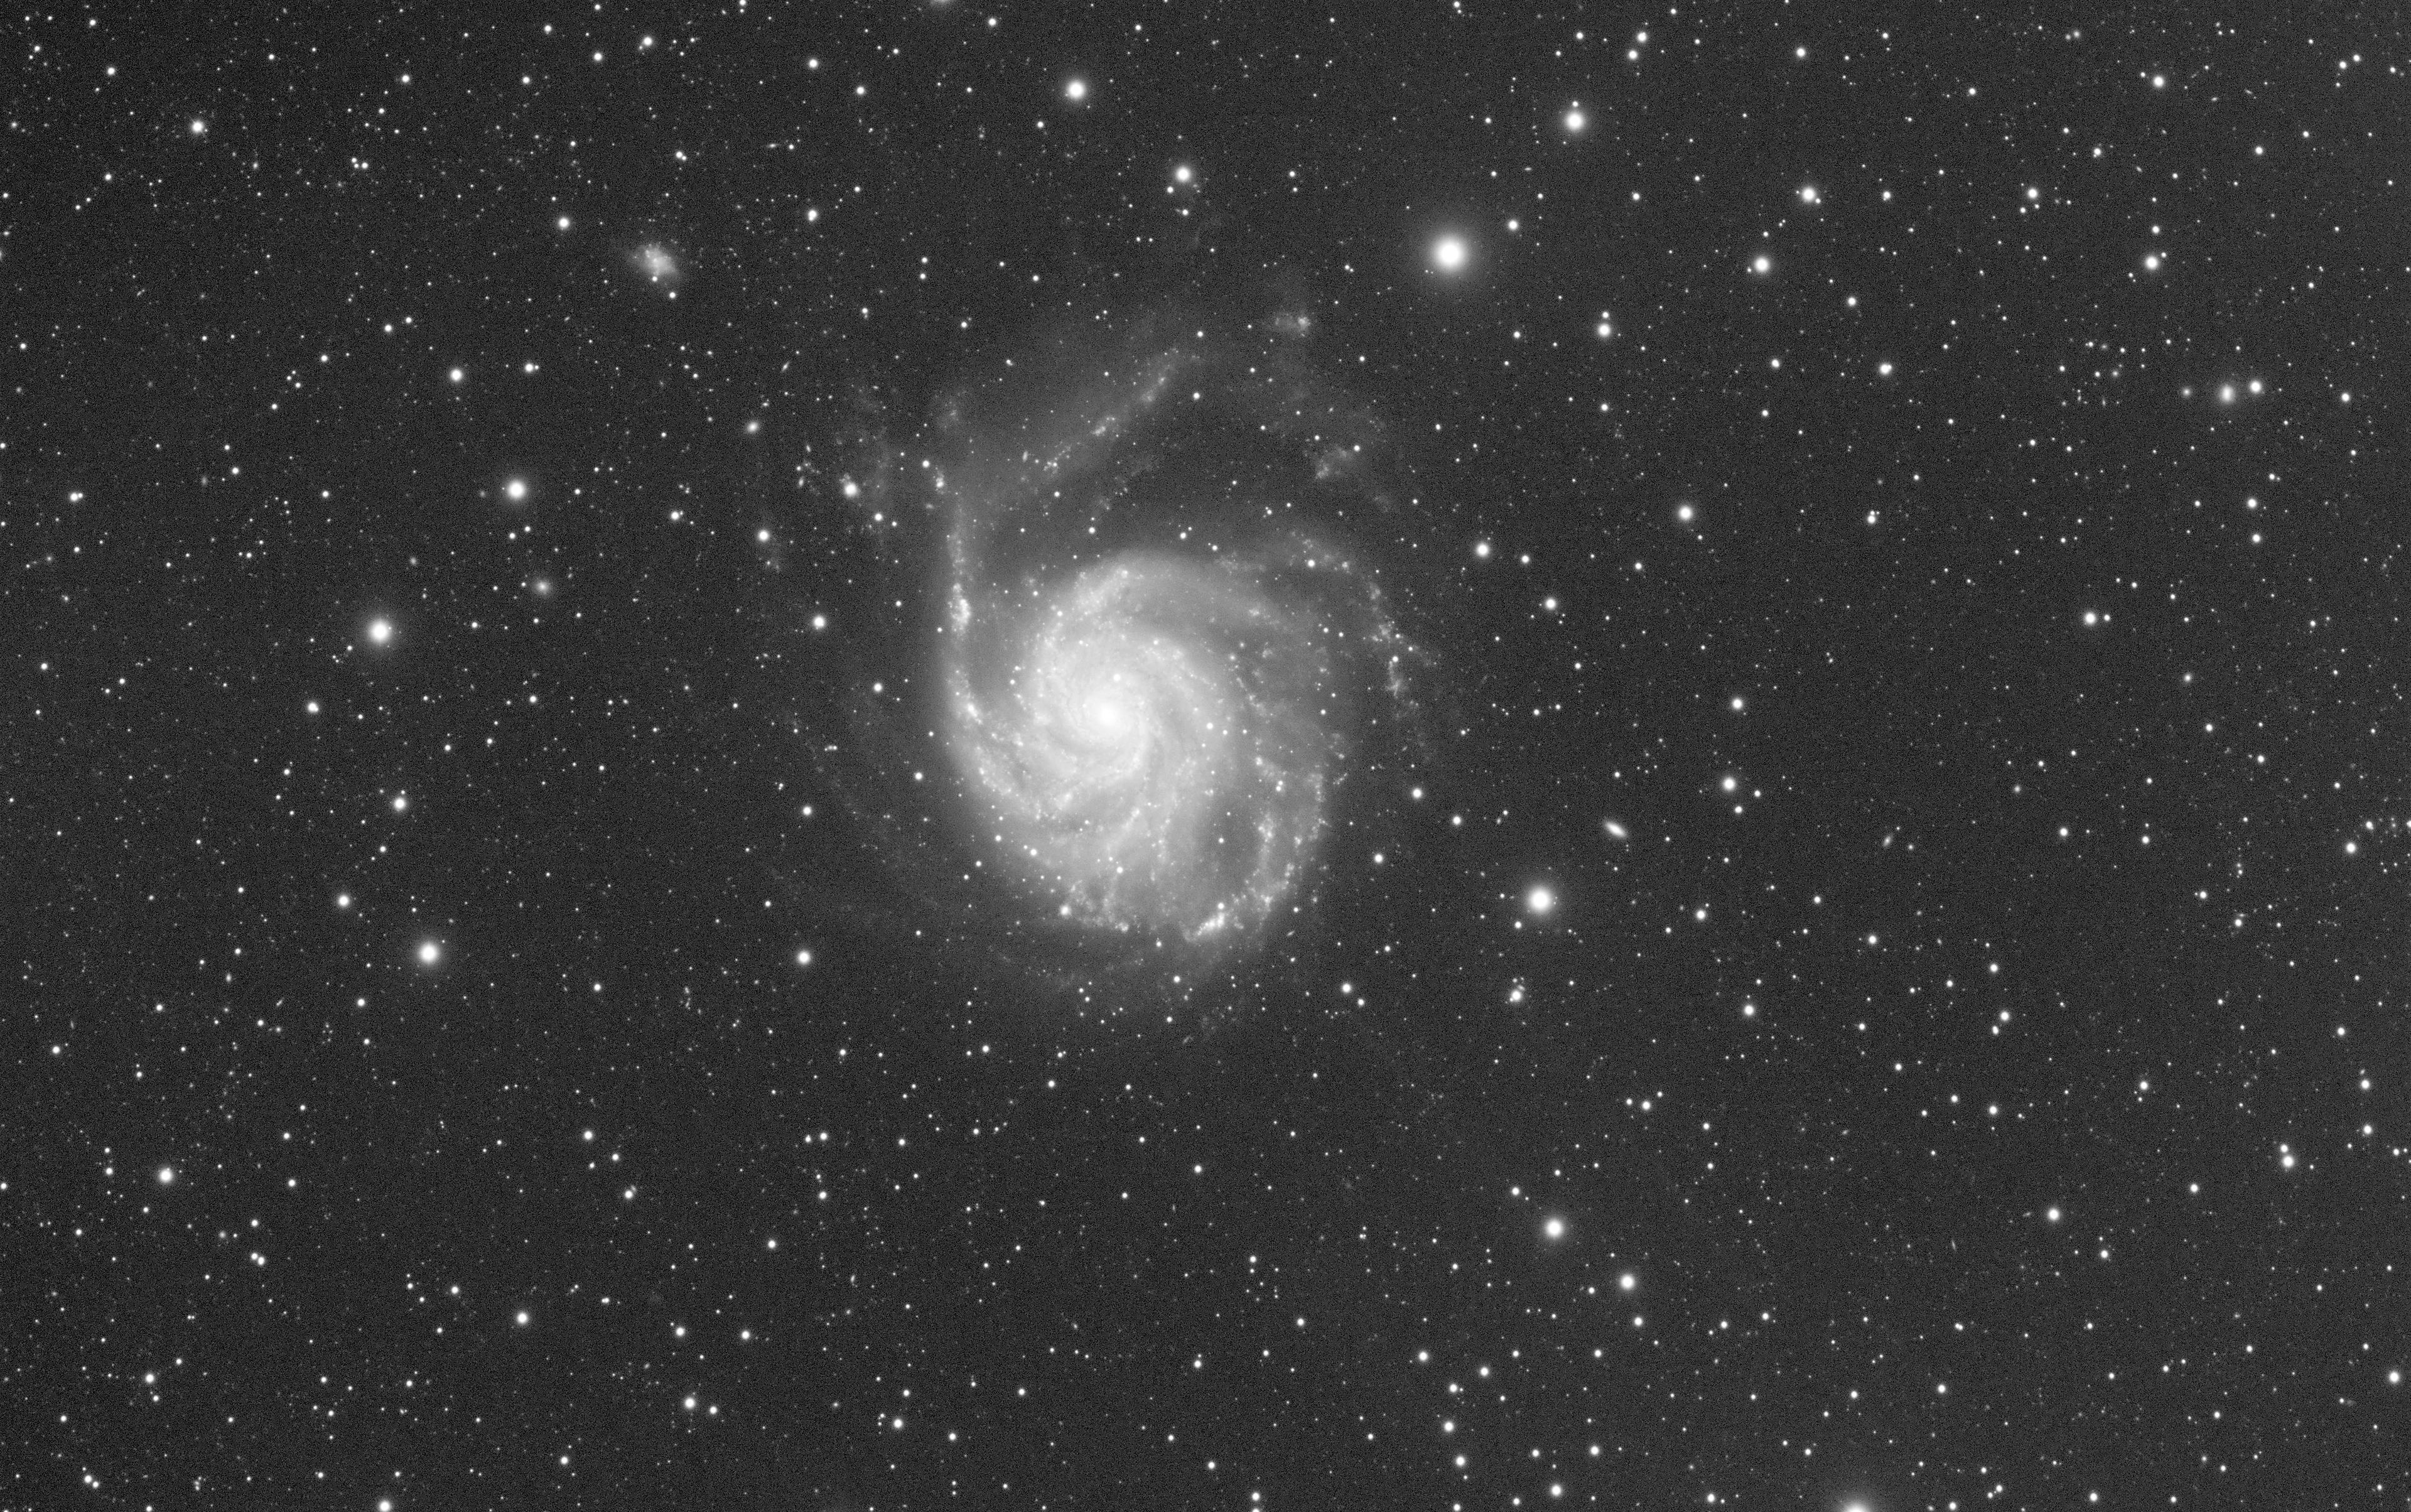 M101_57x120s_183protec-15_o400.jpg